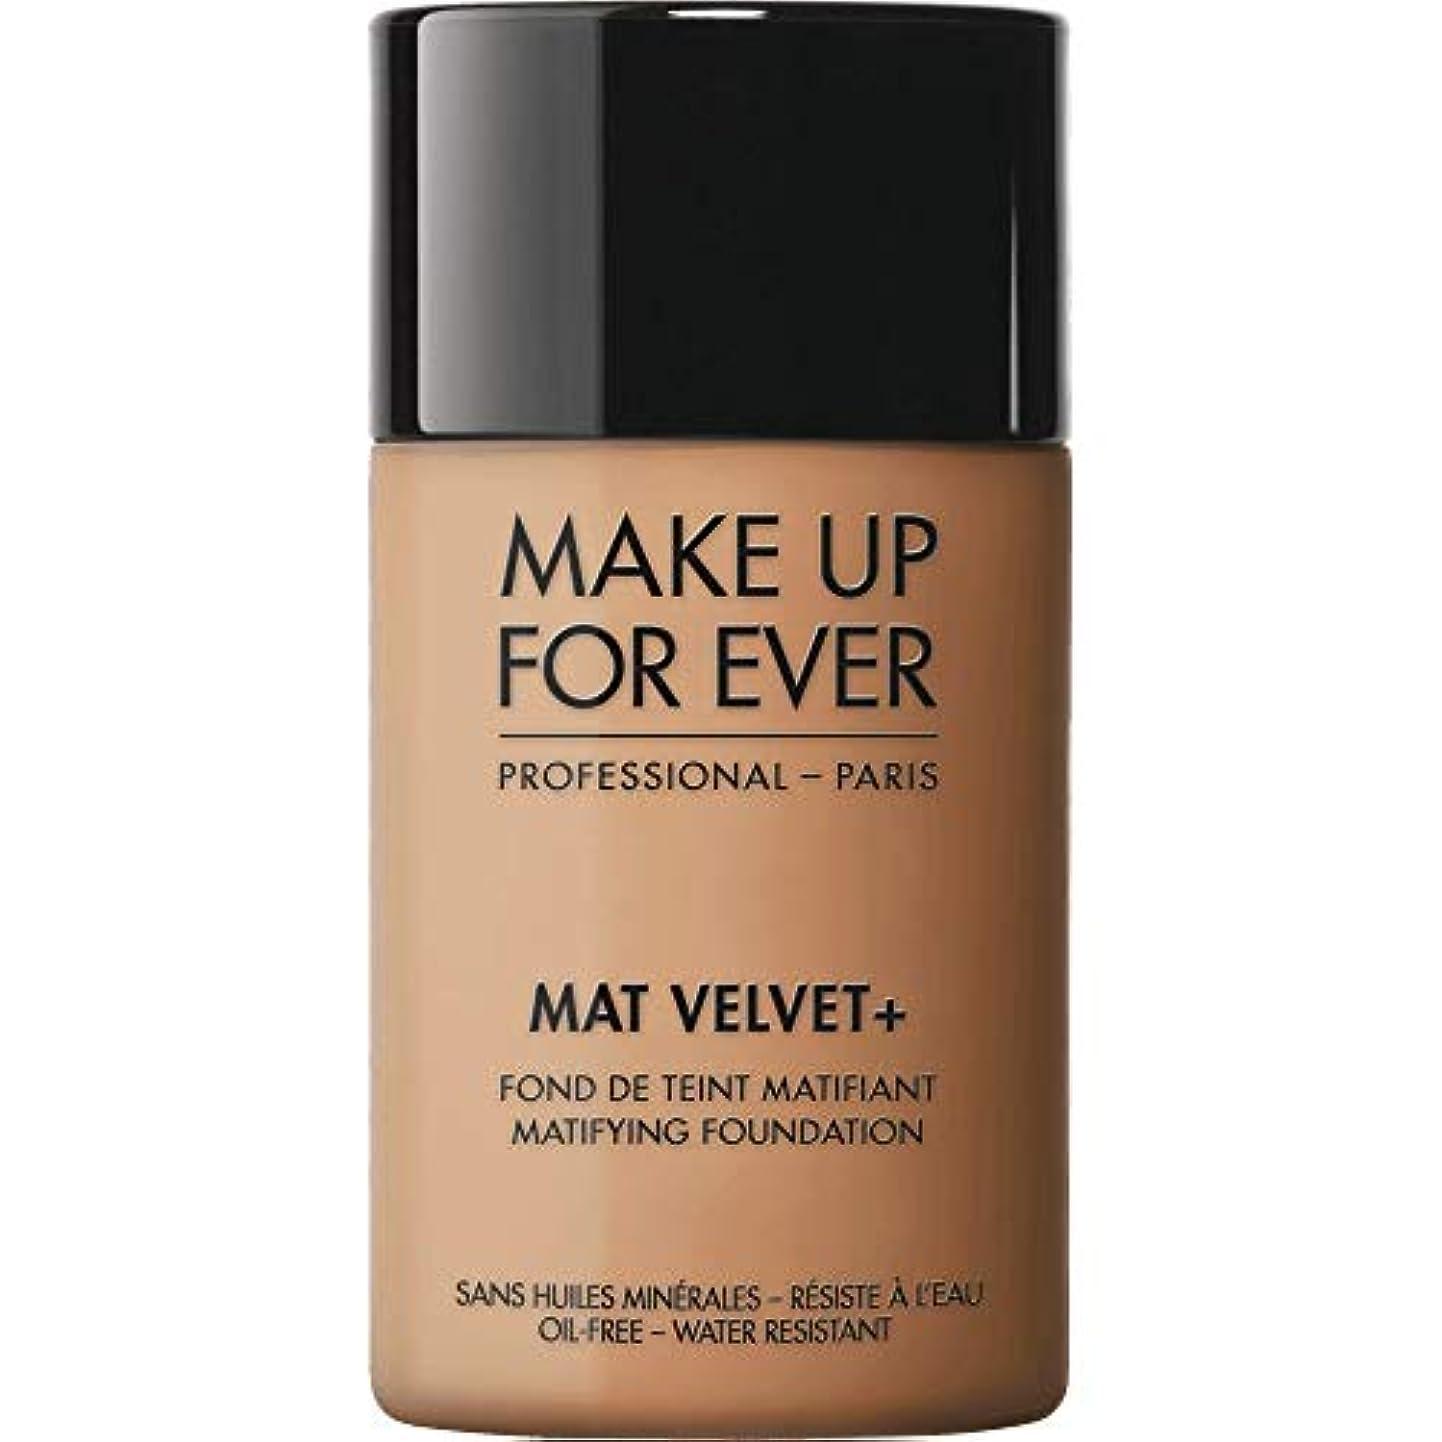 [MAKE UP FOR EVER ] 暖かい琥珀 - これまでマットベルベット+マティファイングの基礎30ミリリットル67を補います - MAKE UP FOR EVER Mat Velvet+ Matifying Foundation...